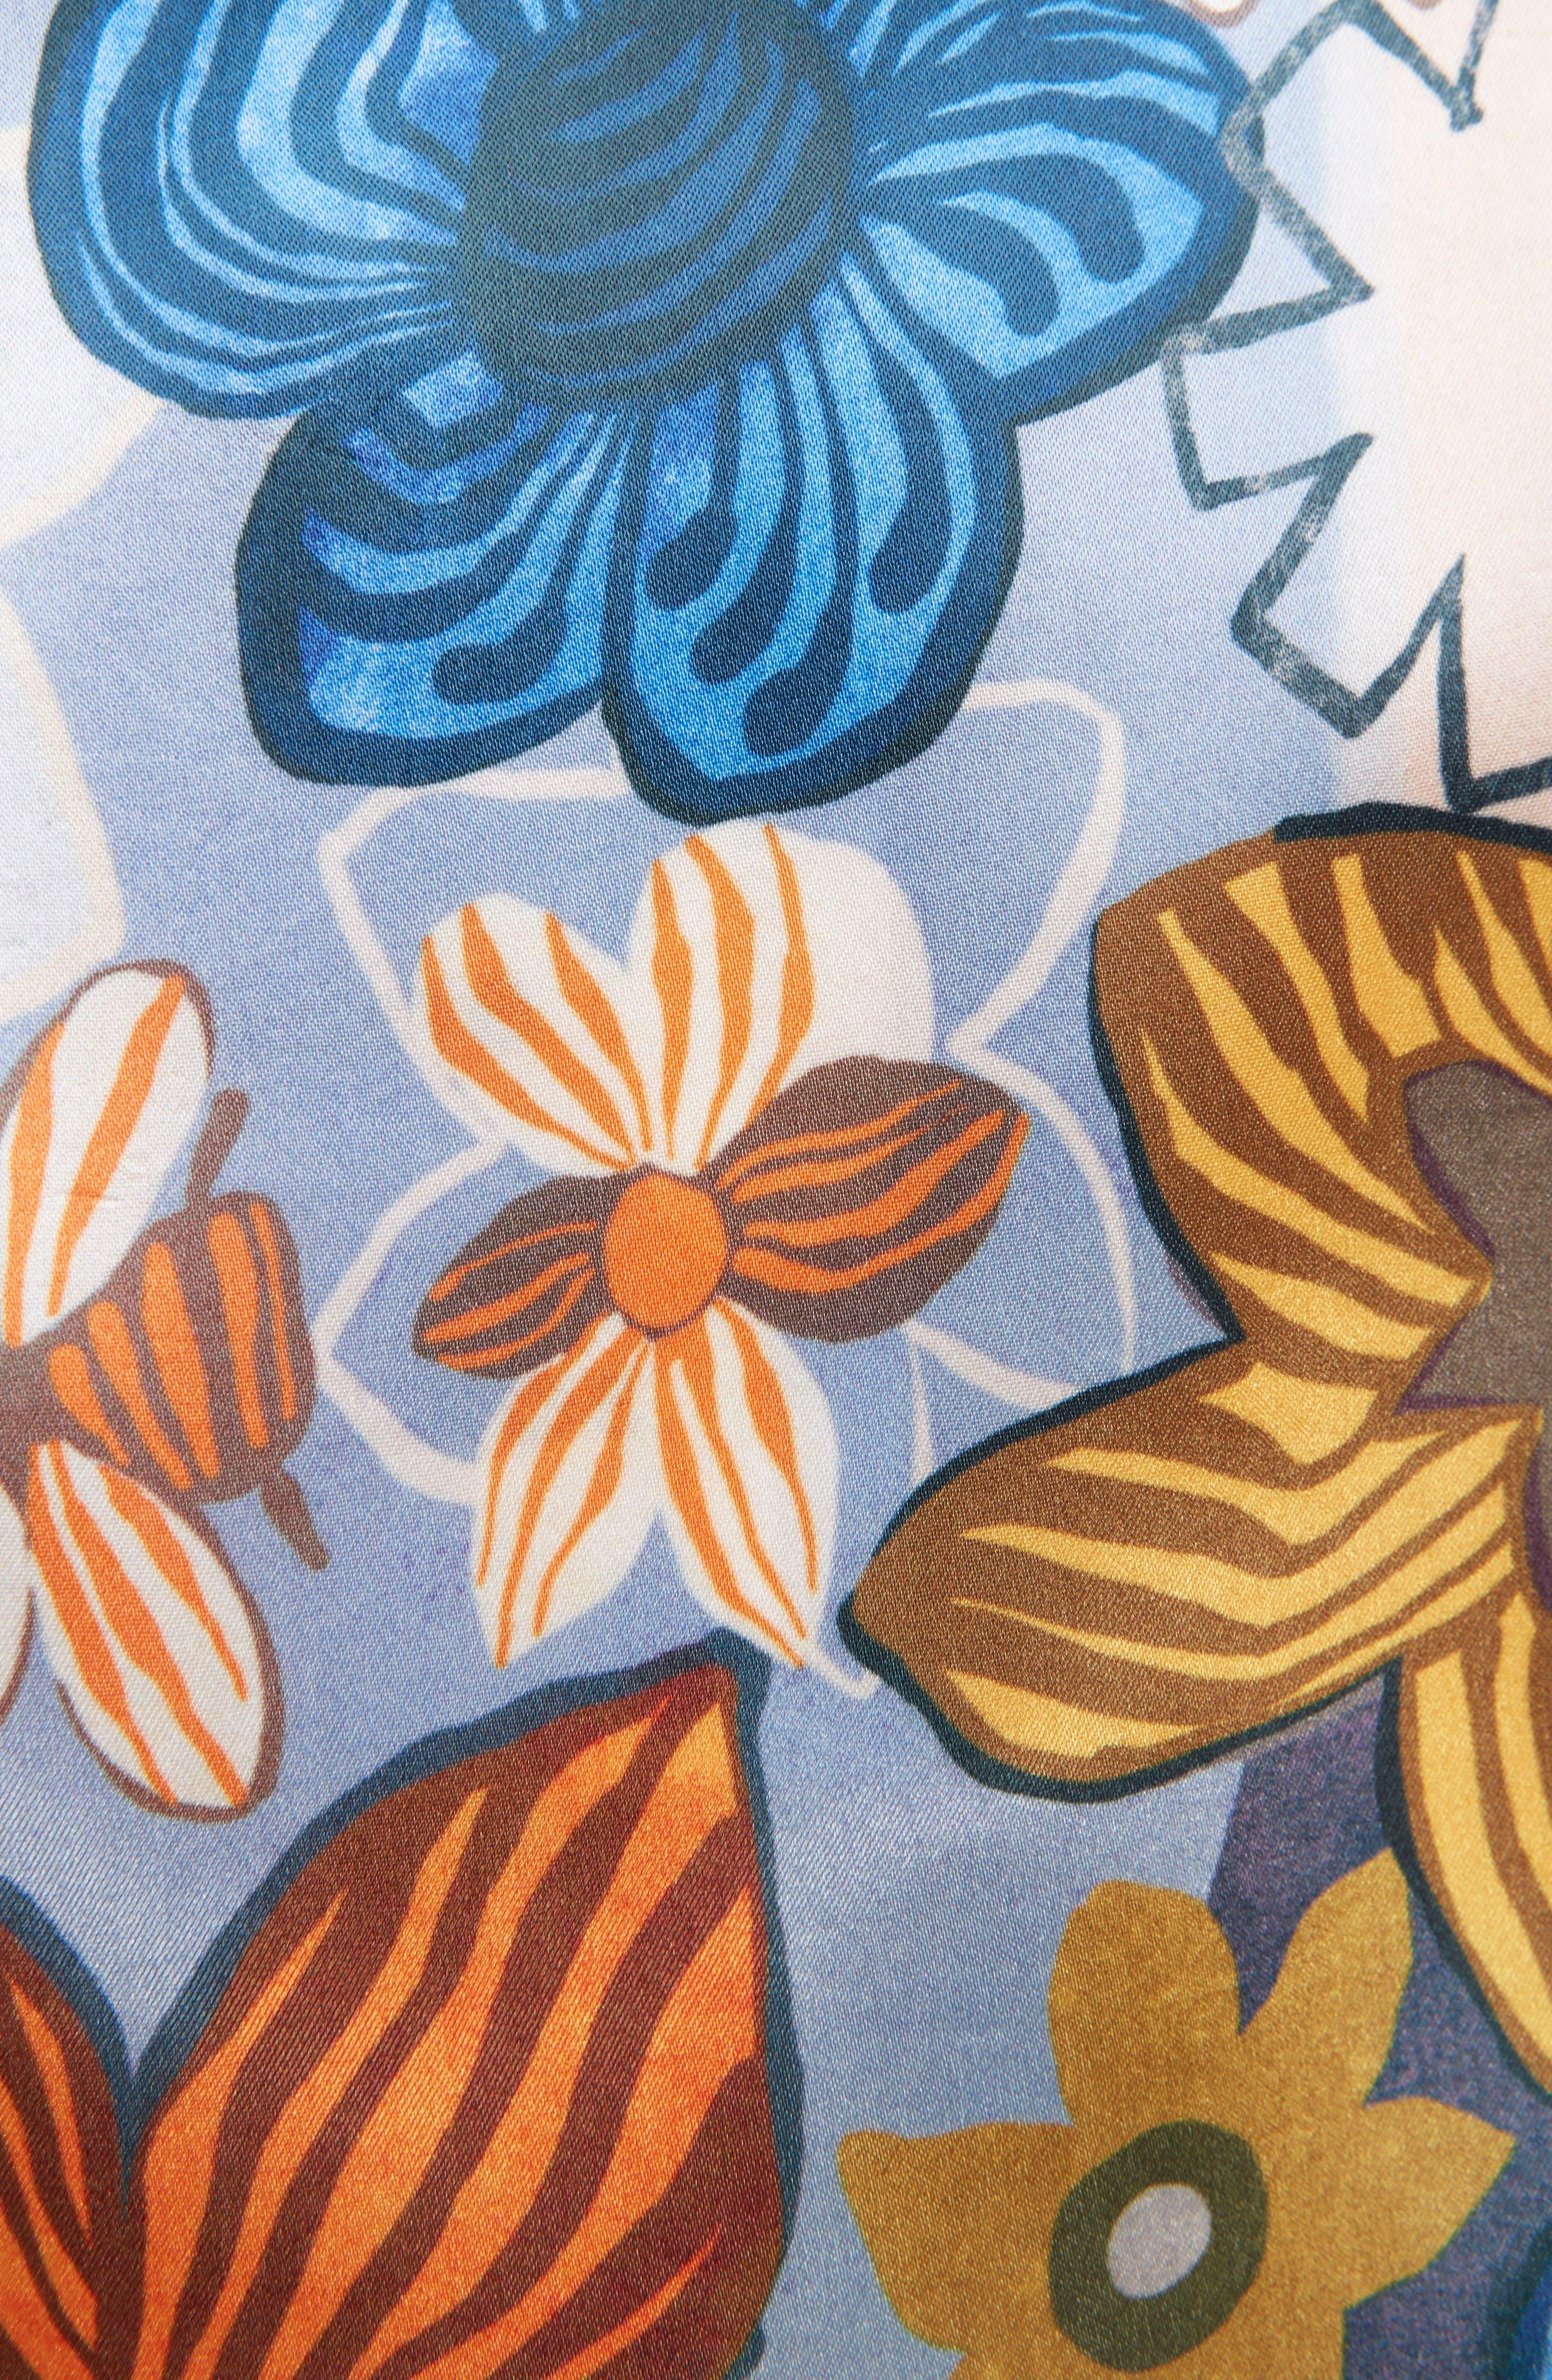 Buse Floral Print Blouse,                             Alternate thumbnail 3, color,                             Retro Flower Pink